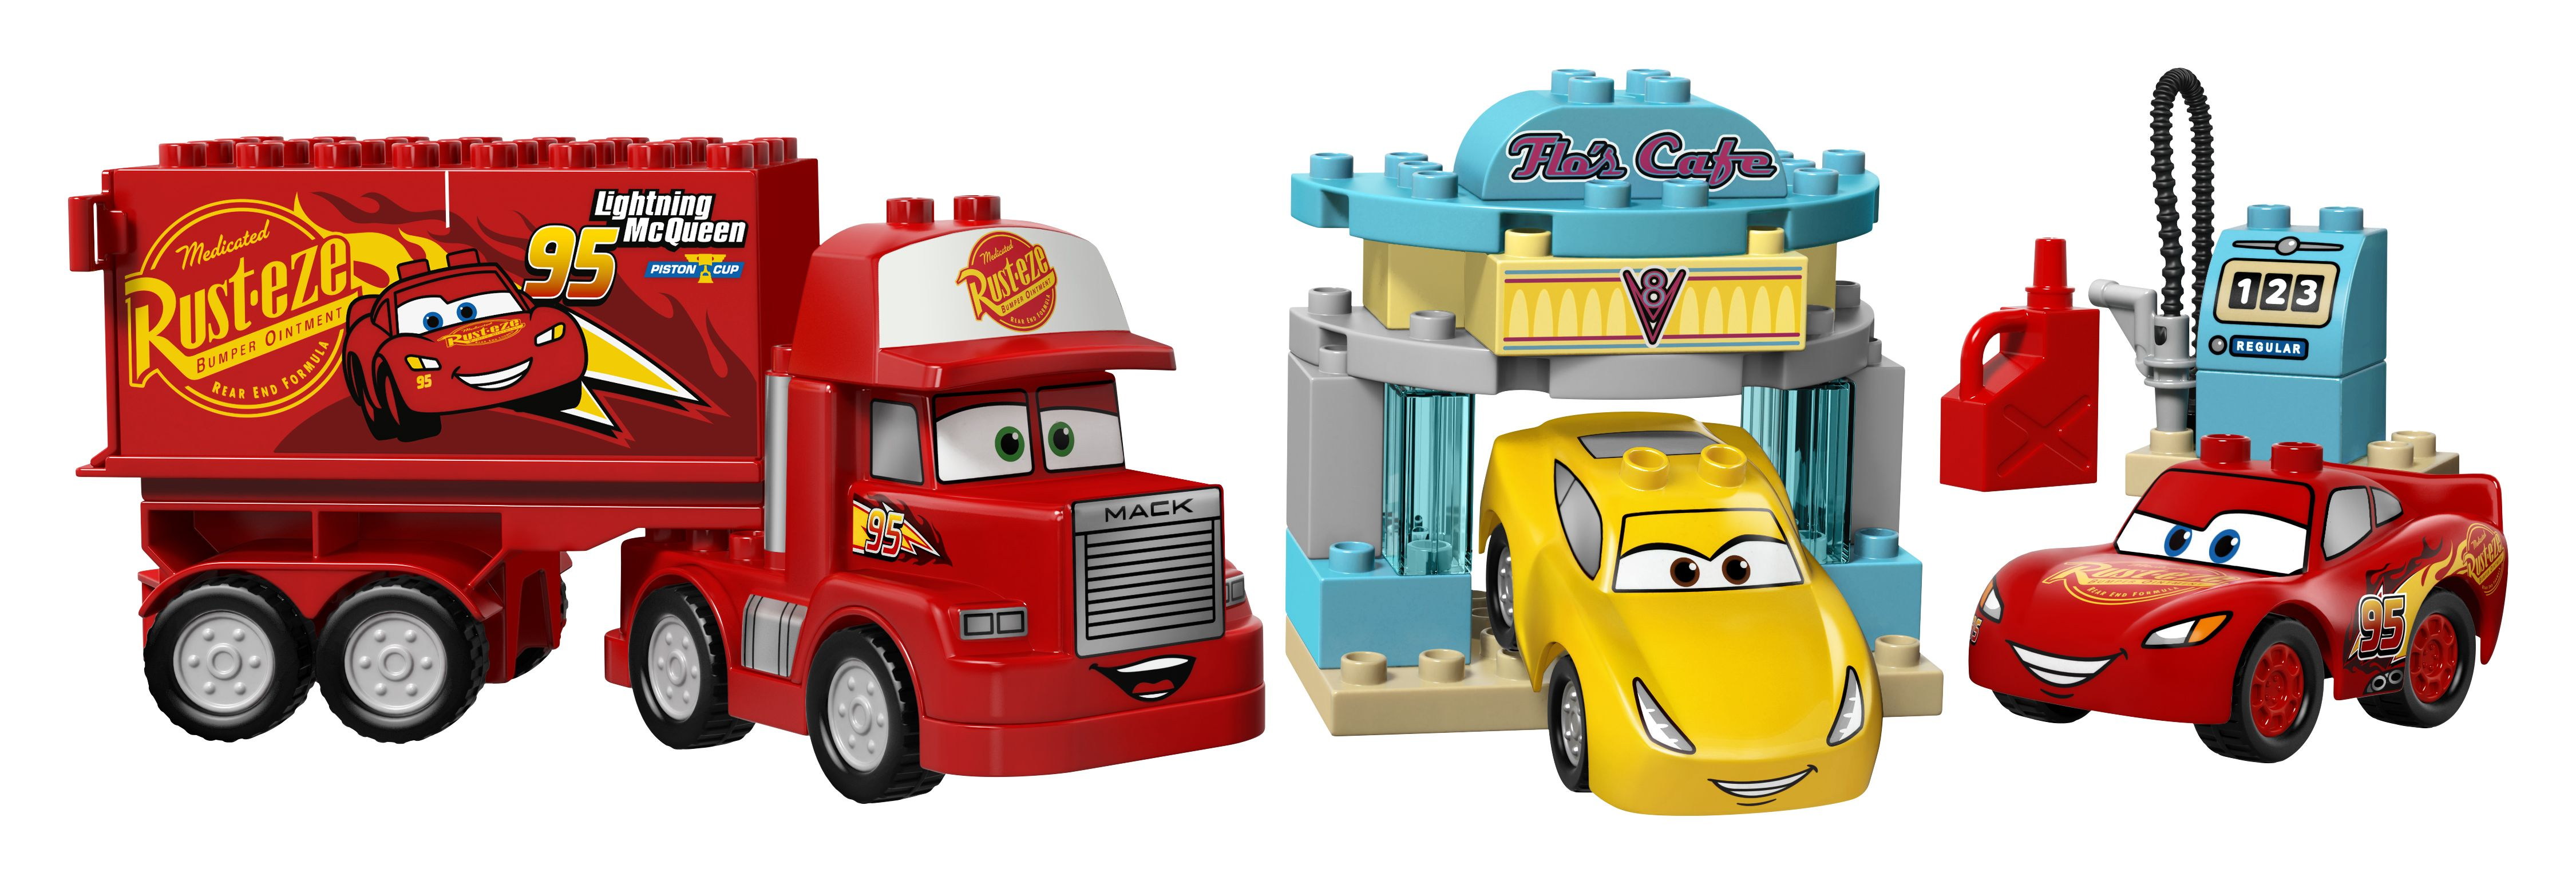 "LEGO Announces ""Cars 3"" Duplo and Lego Juniors Sets"